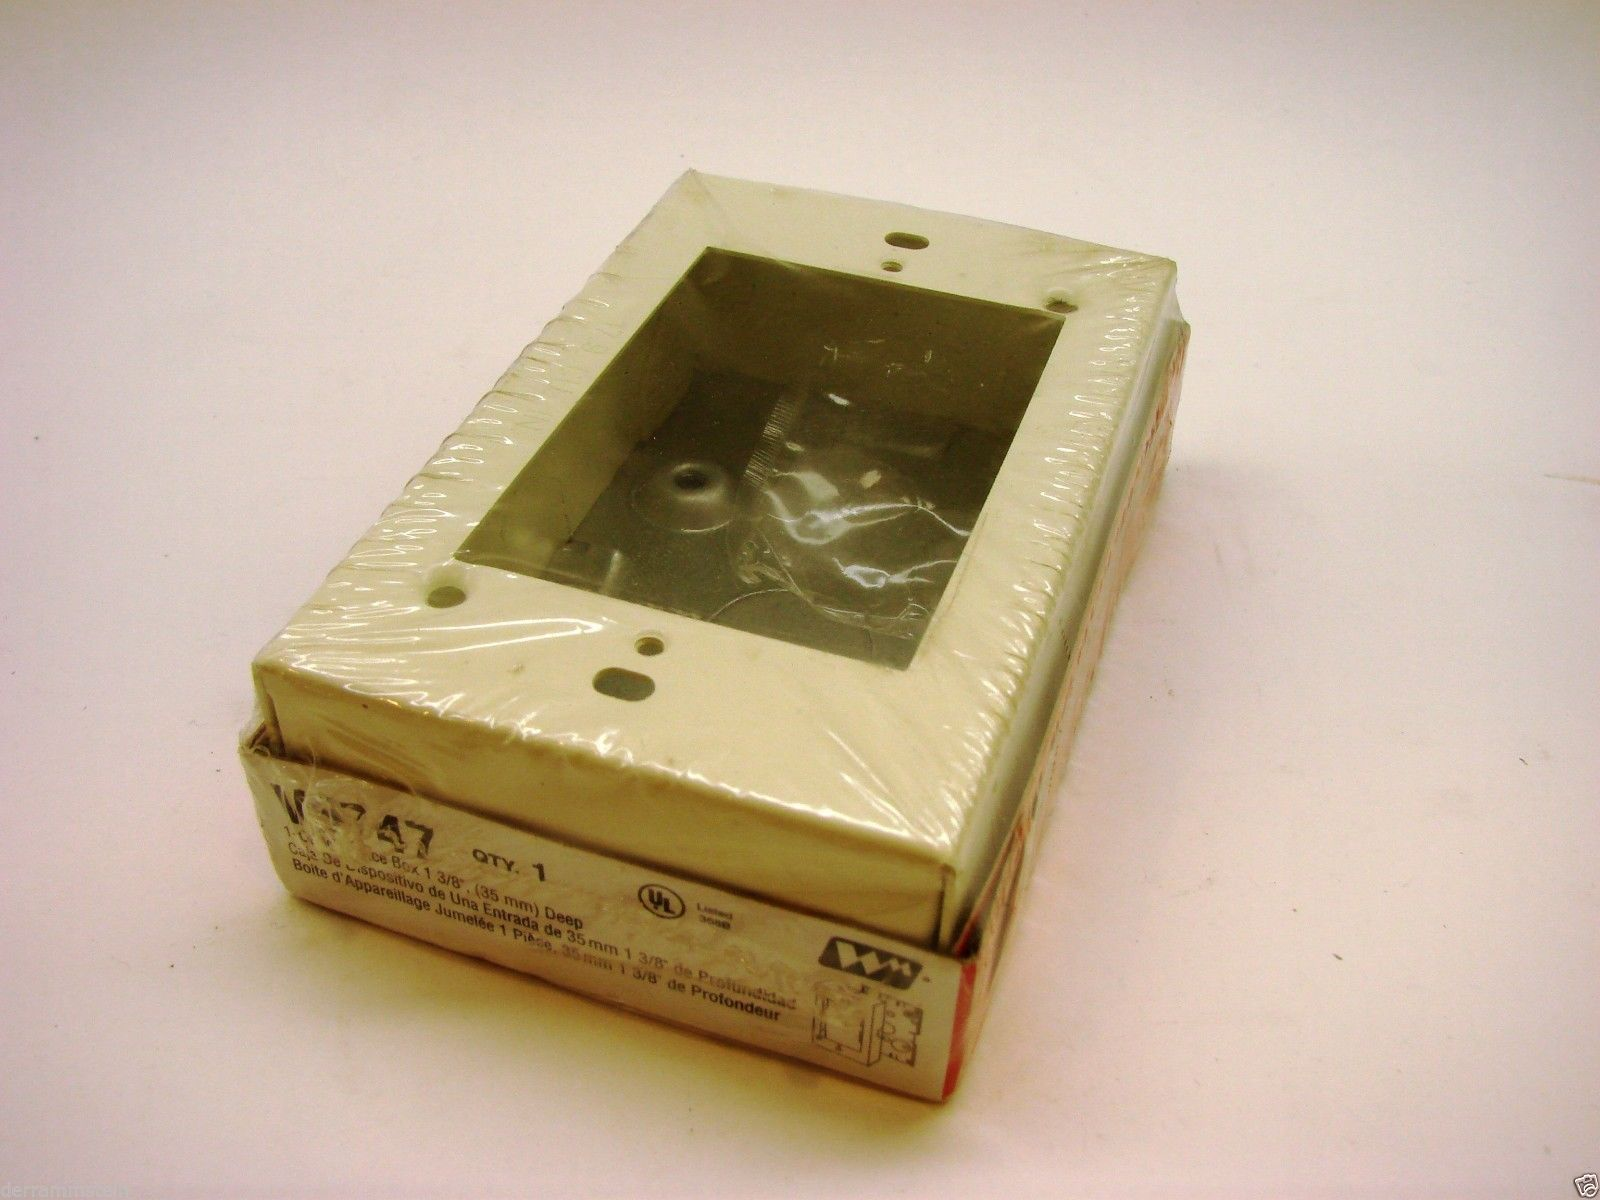 WIREMOLD V5747 Raceway Single Gang Device Box New f3